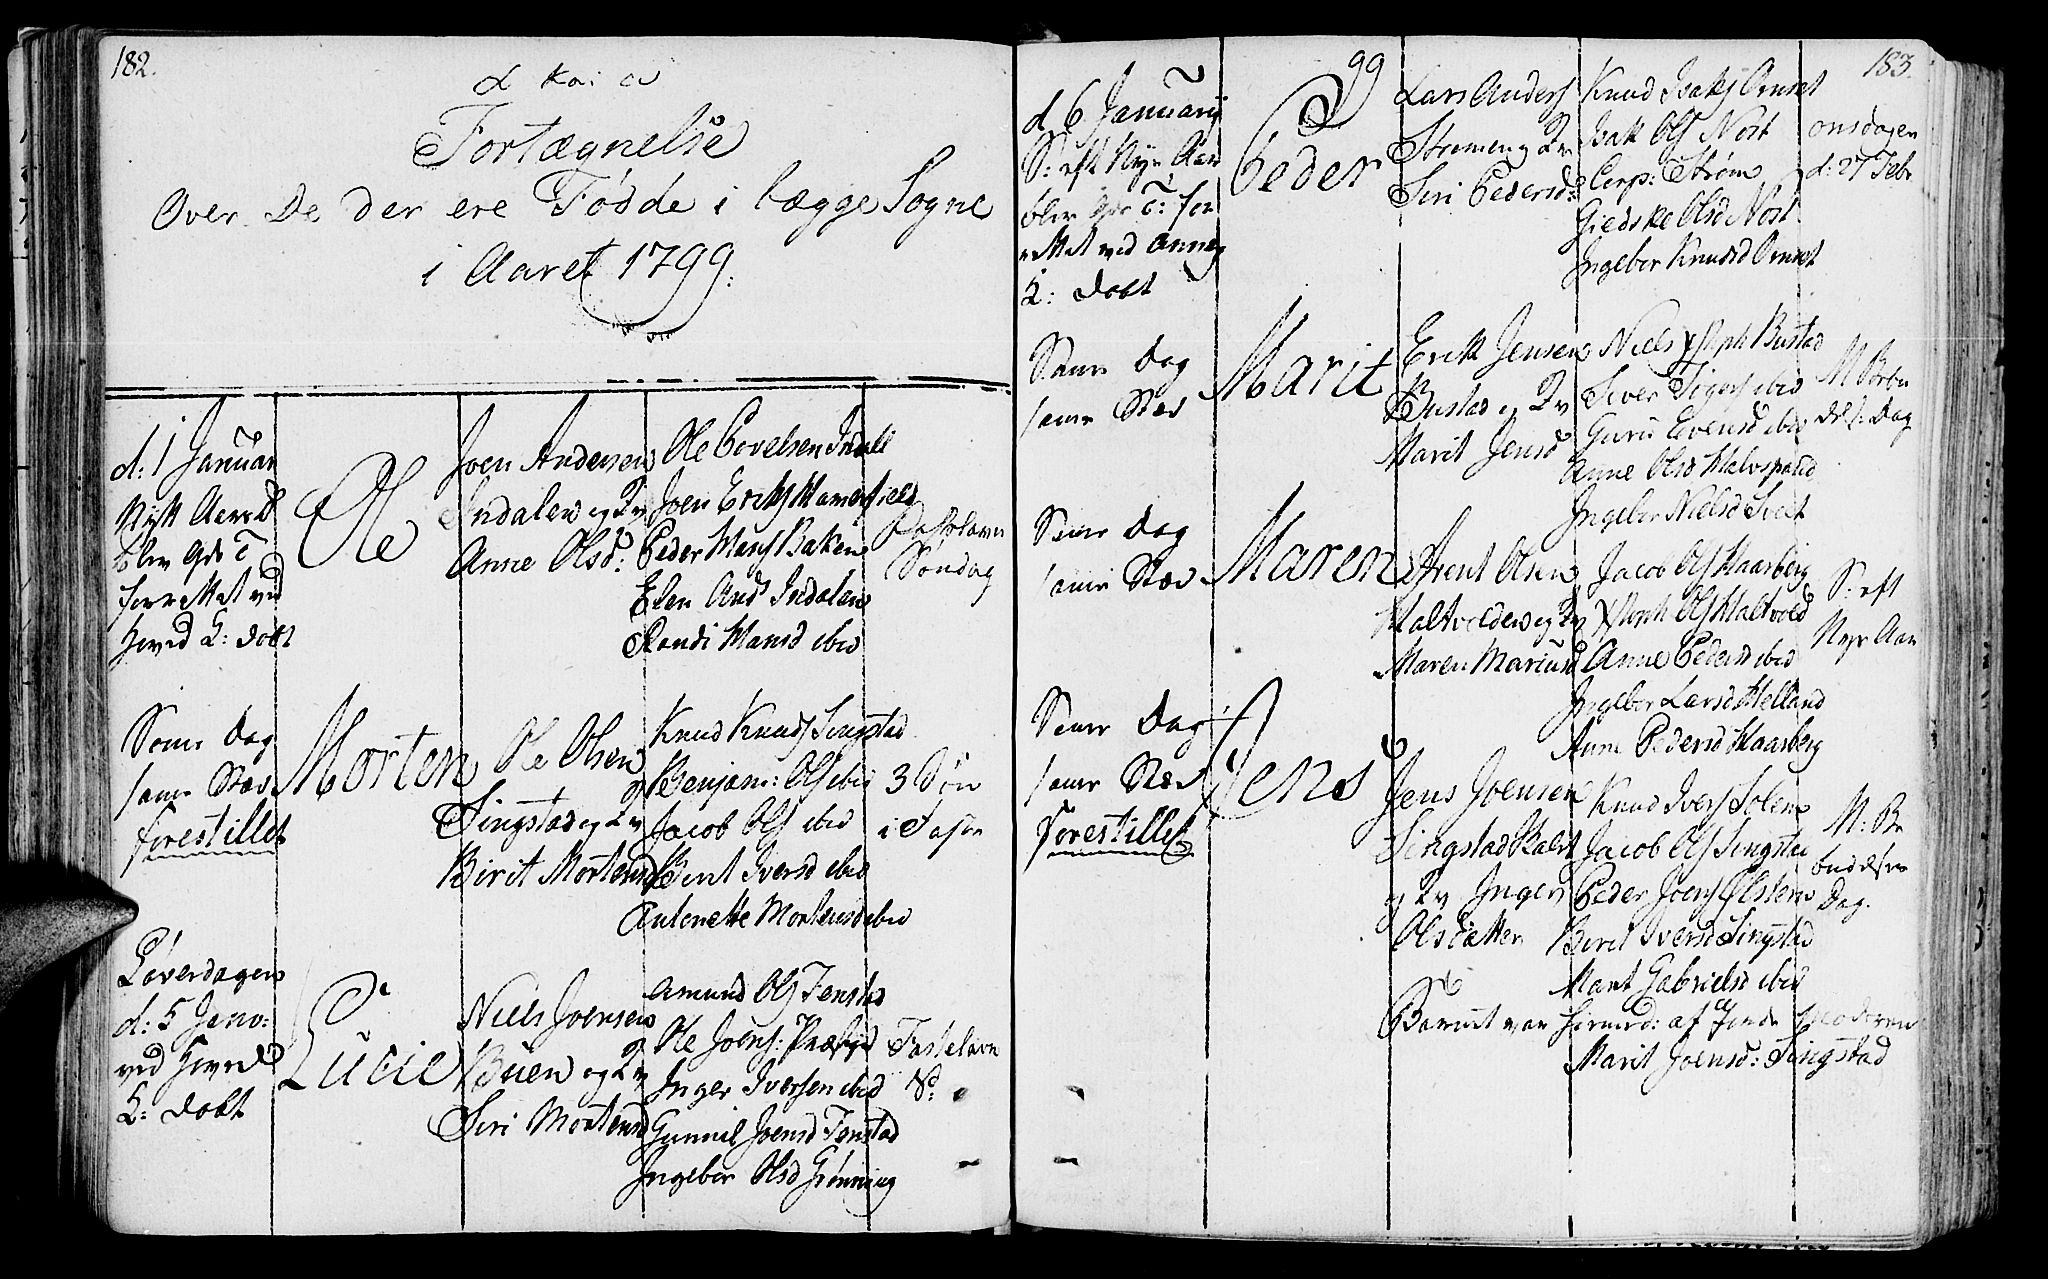 SAT, Ministerialprotokoller, klokkerbøker og fødselsregistre - Sør-Trøndelag, 646/L0606: Parish register (official) no. 646A04, 1791-1805, p. 182-183